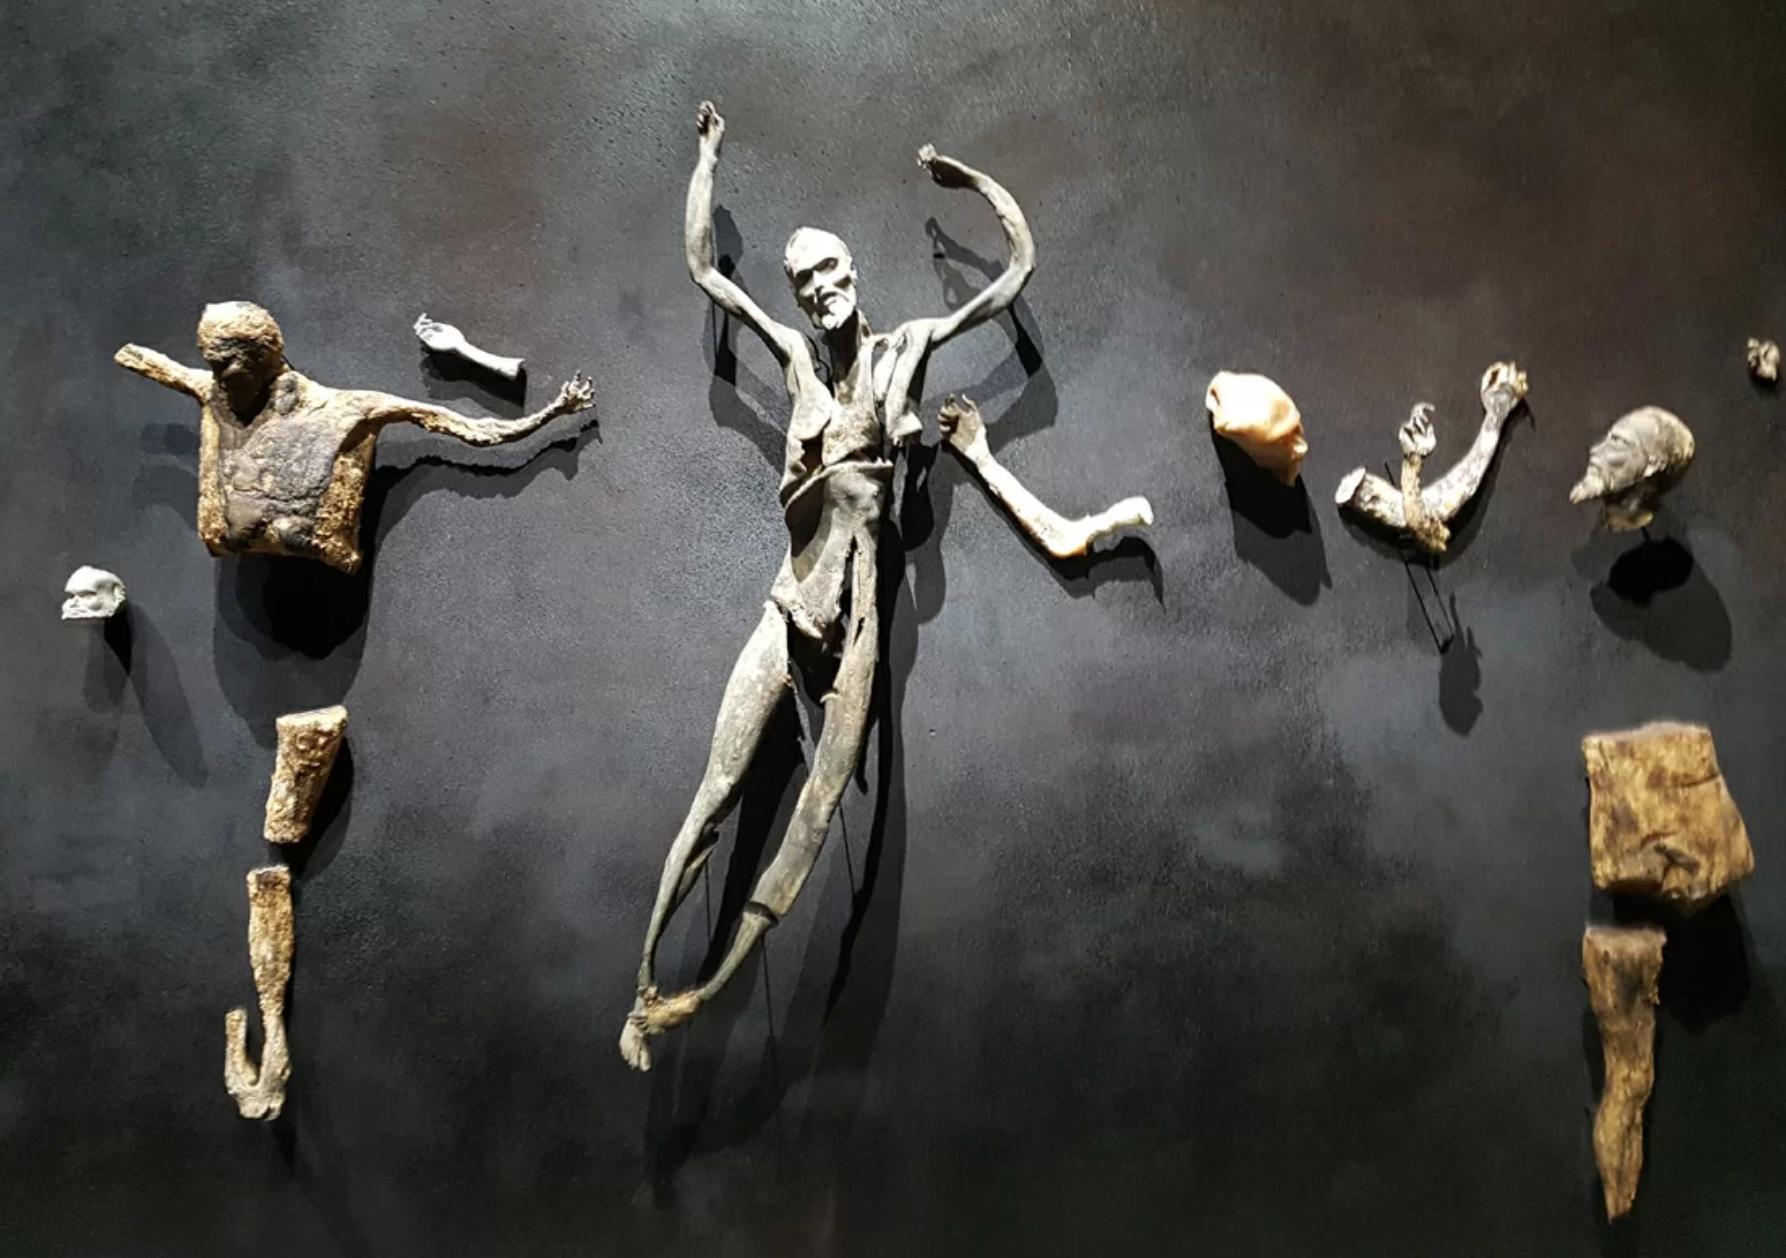 L'arte contemporanea italiana? È fallita